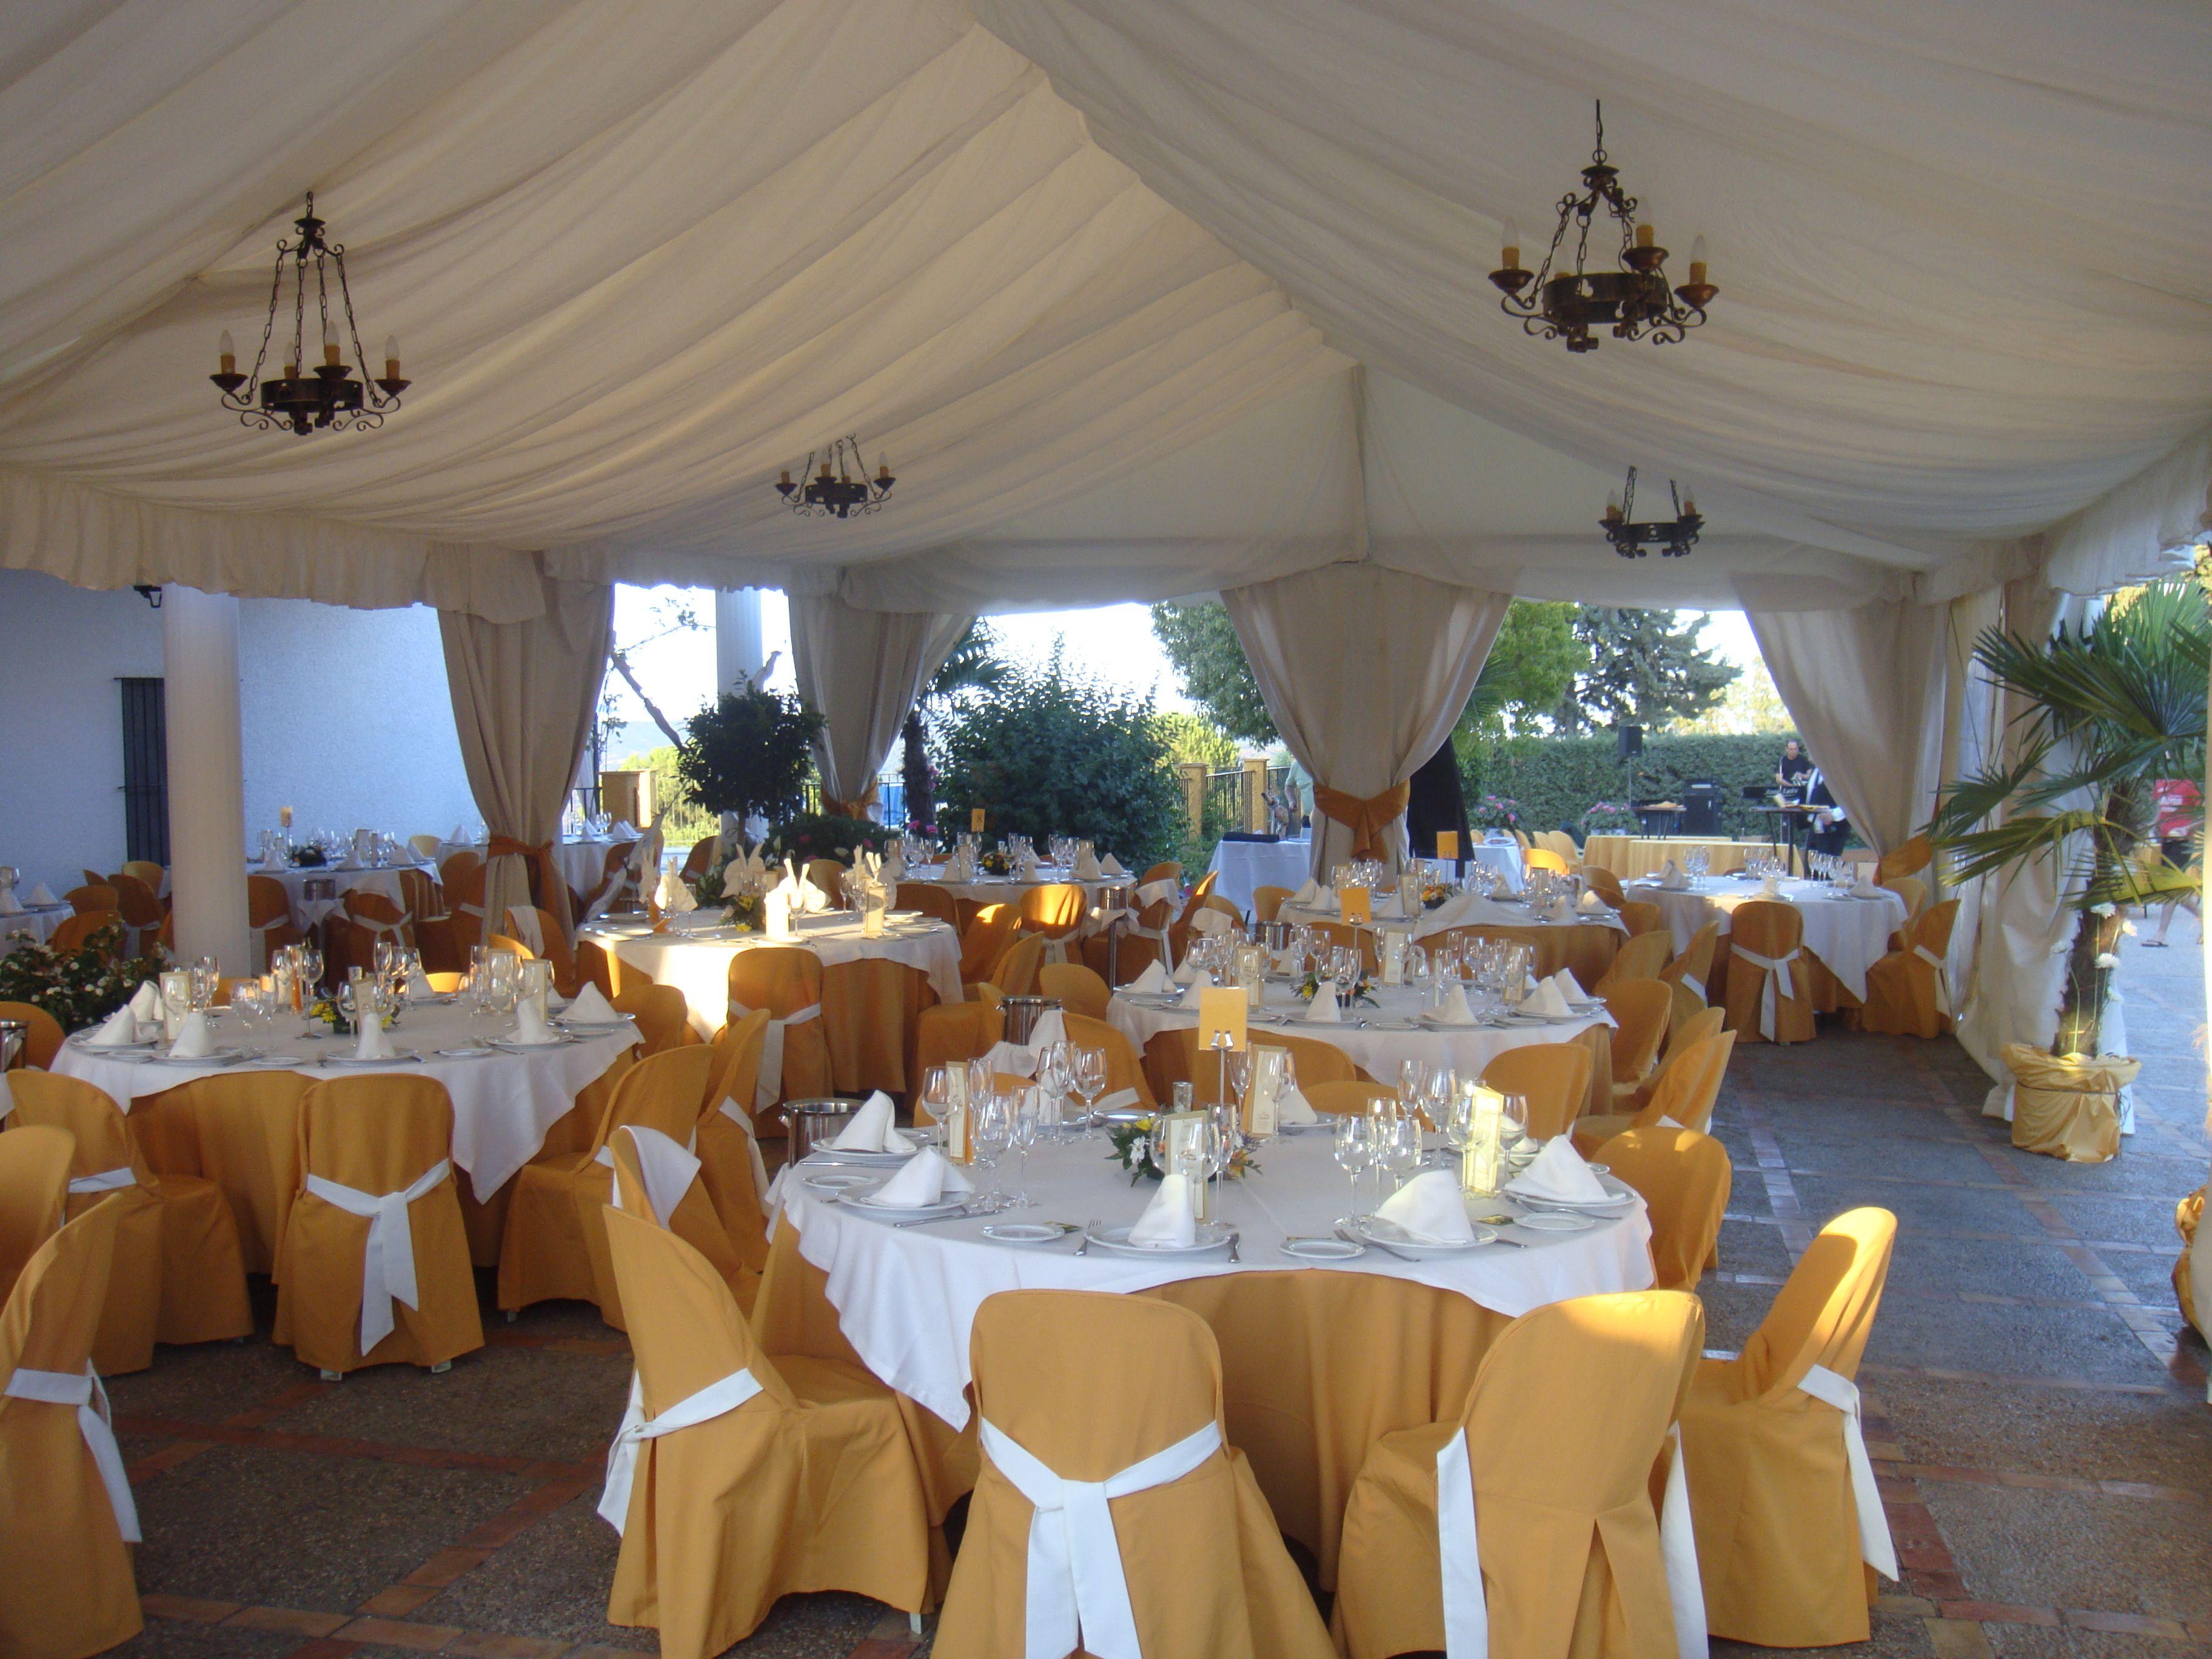 Carpas para bodas 2 beach wedding ideas pinterest - Decoracion de carpas para bodas ...